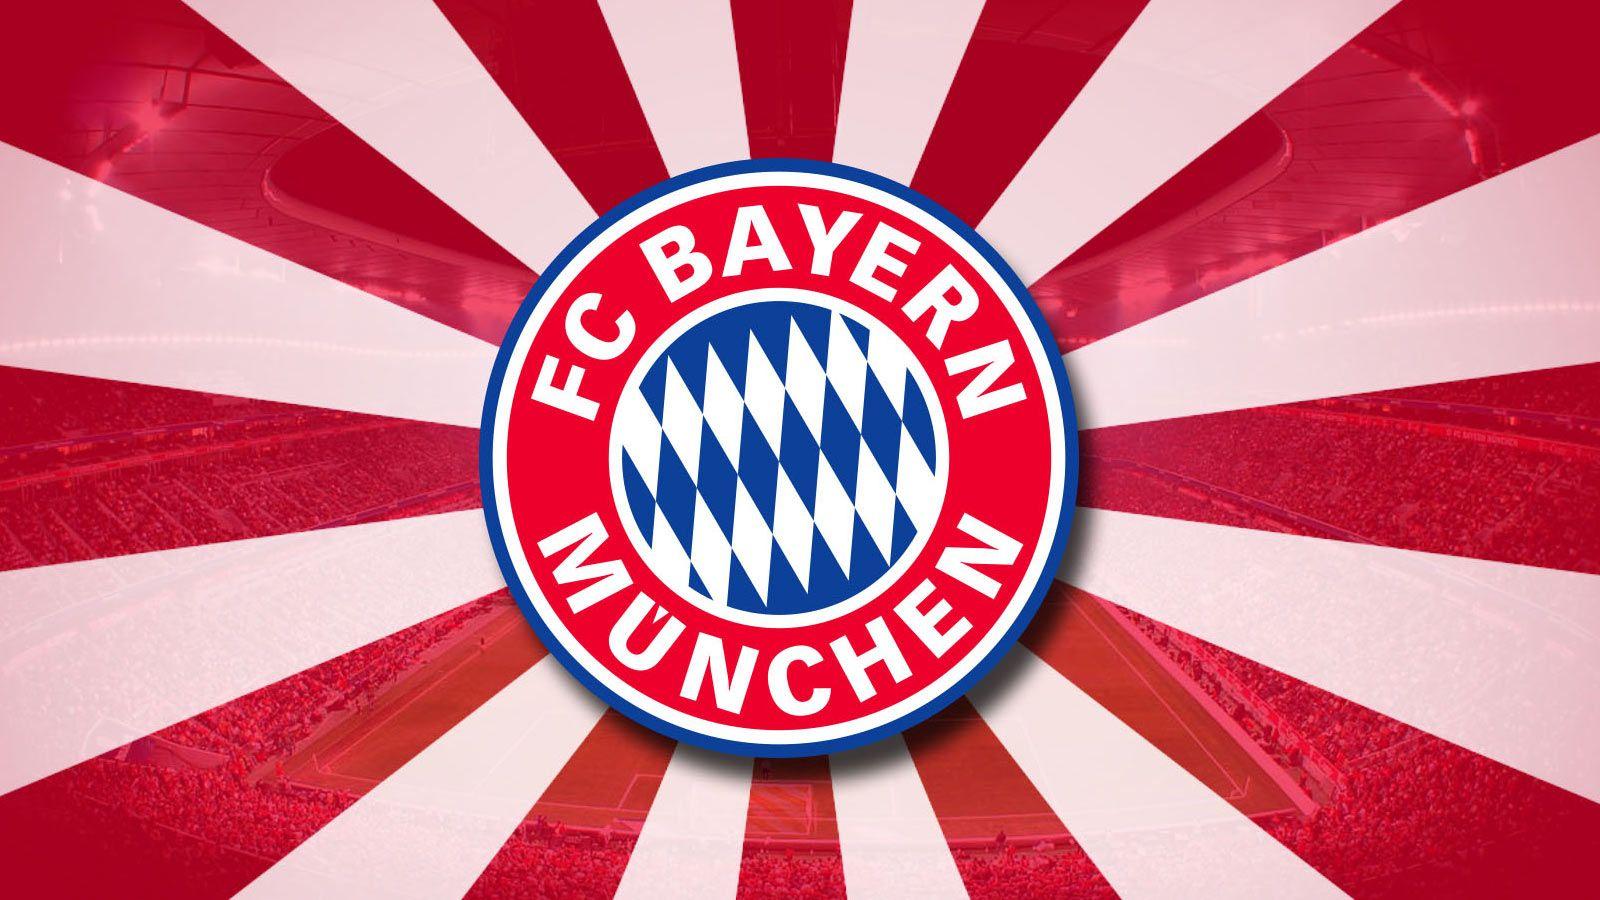 Bayern Munich Bayern Munich Bayern Munich Wallpaper Bayern Munich Wallpapers Logo